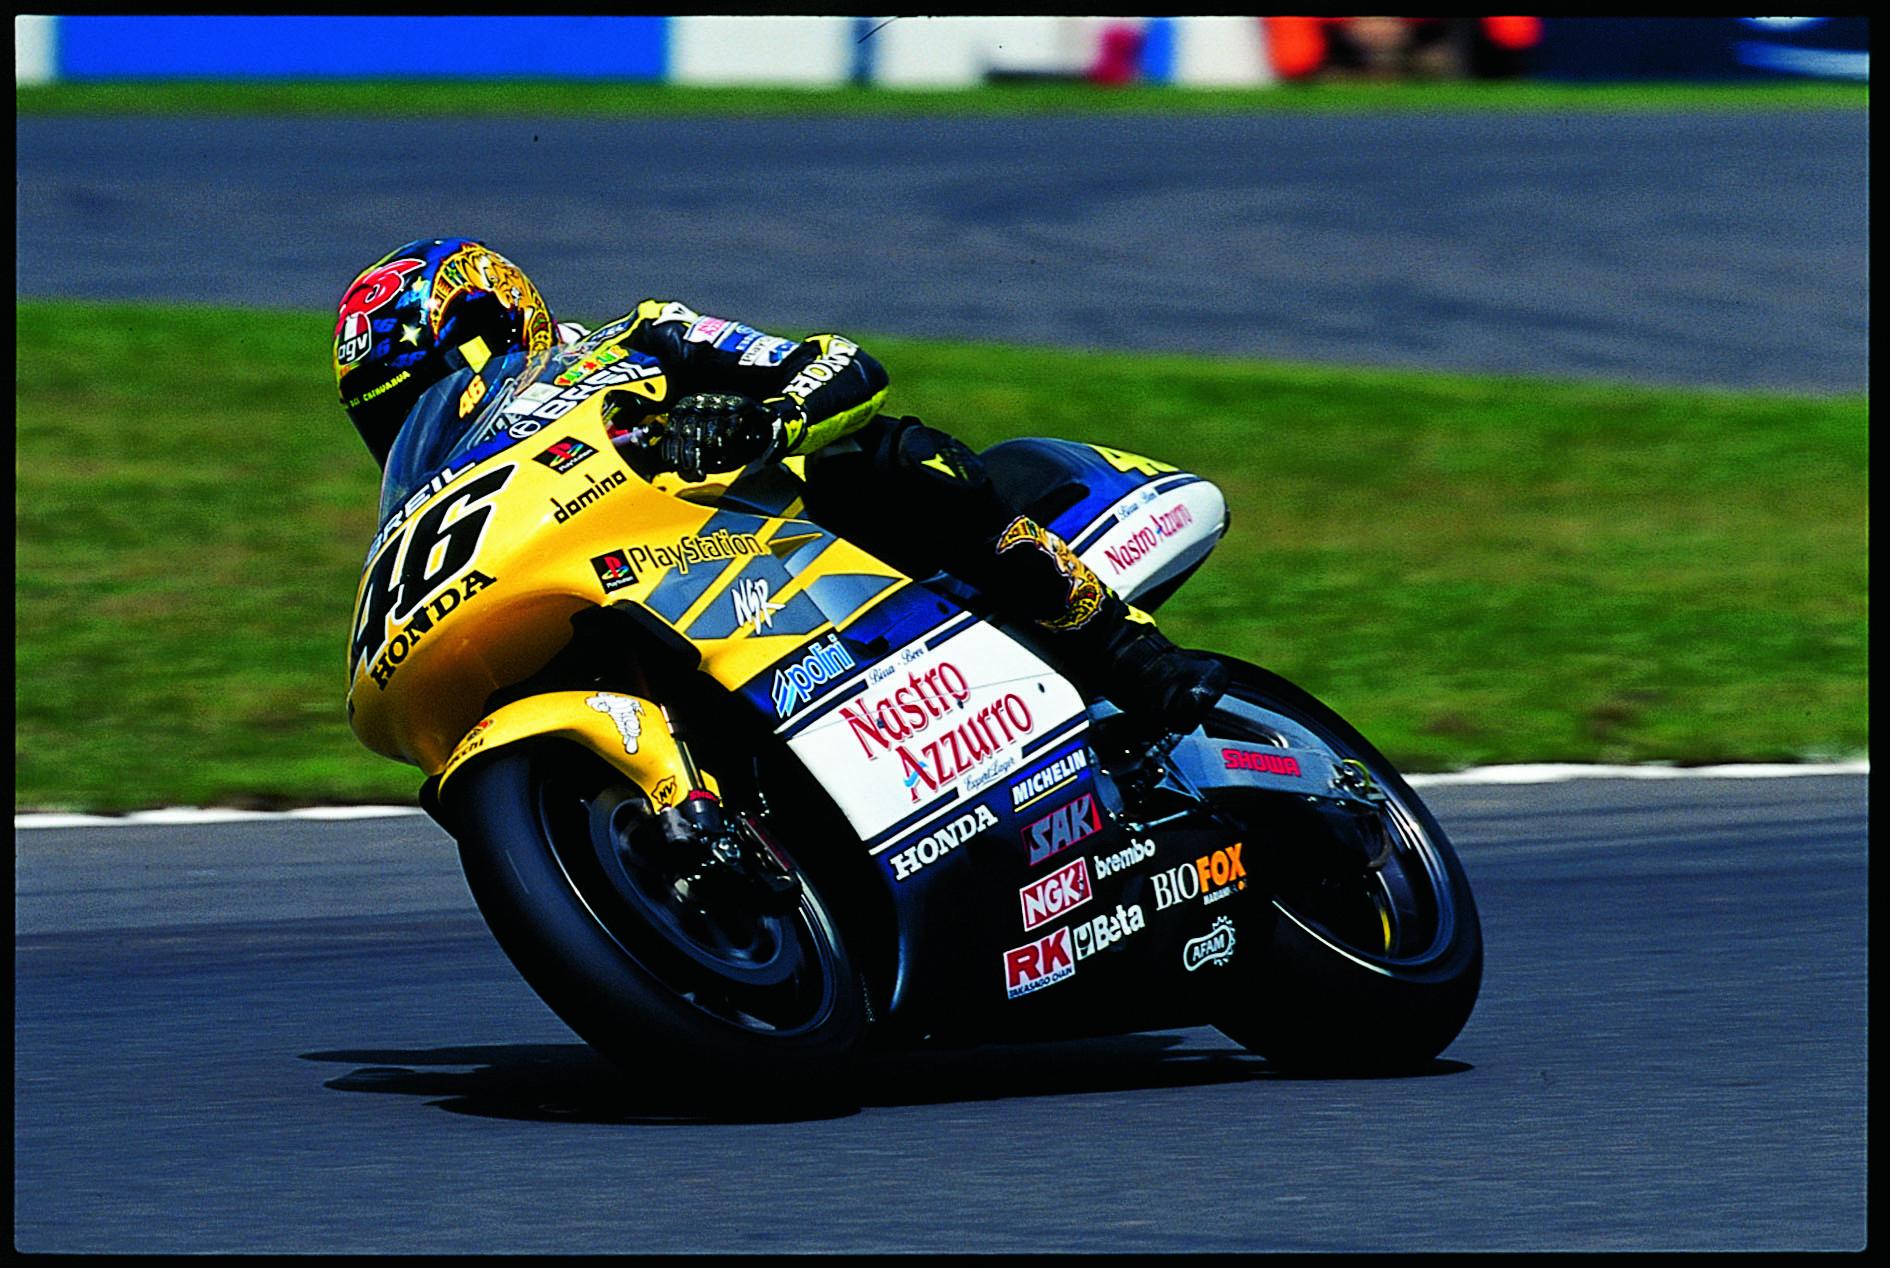 Valentino Rossi 46 Honda HRC primera victoria donington park 2000